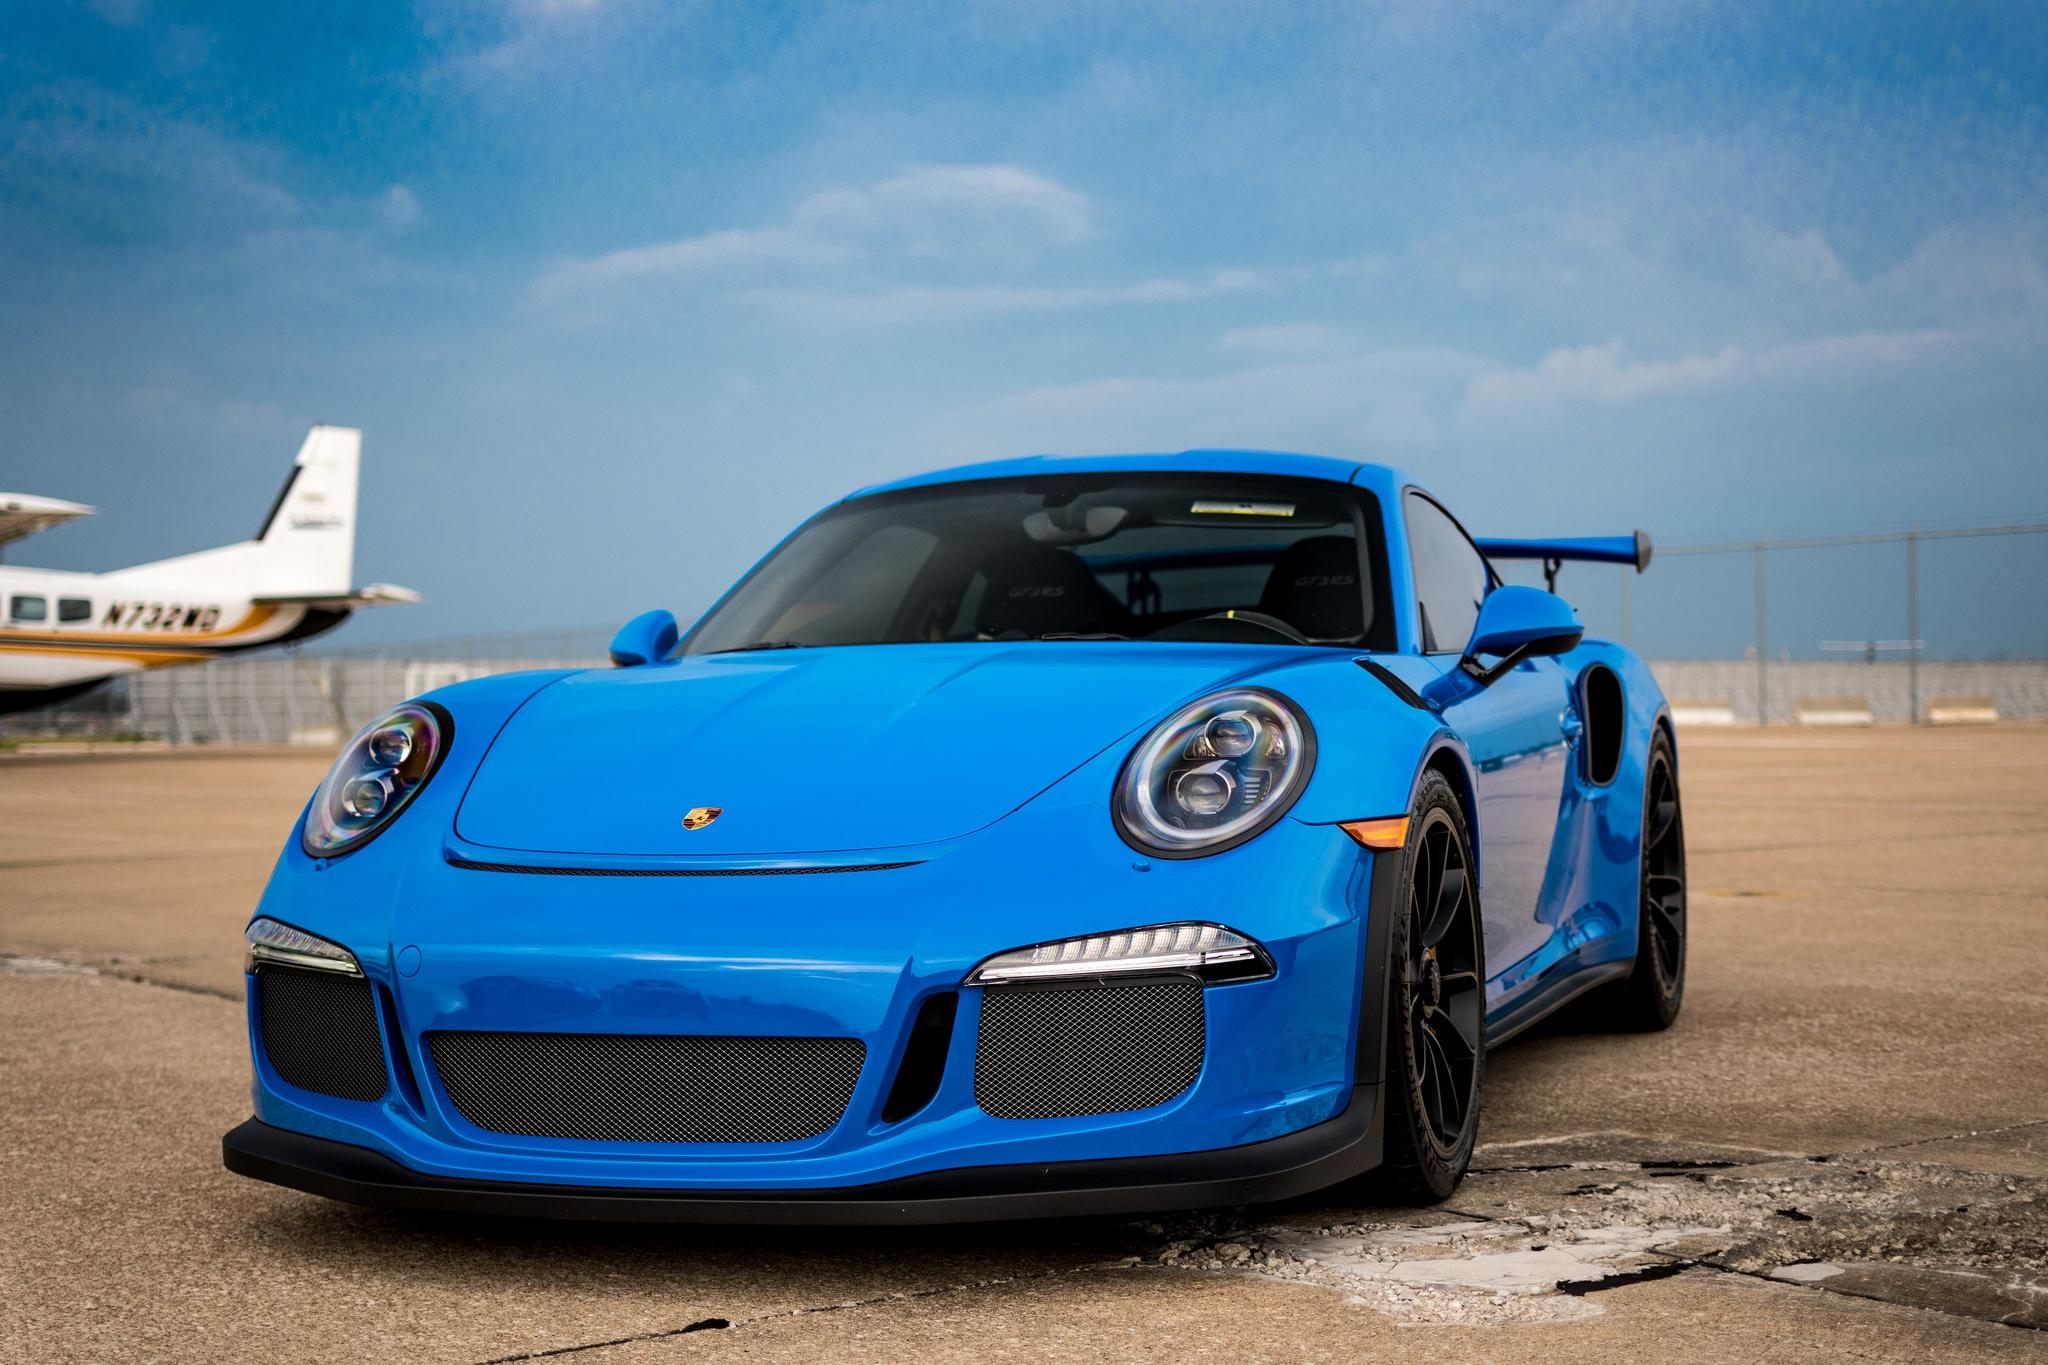 Porsche 911 Gt3 Rs Wallpaper: Porsche 911 GT3 Wallpapers, Pictures, Images